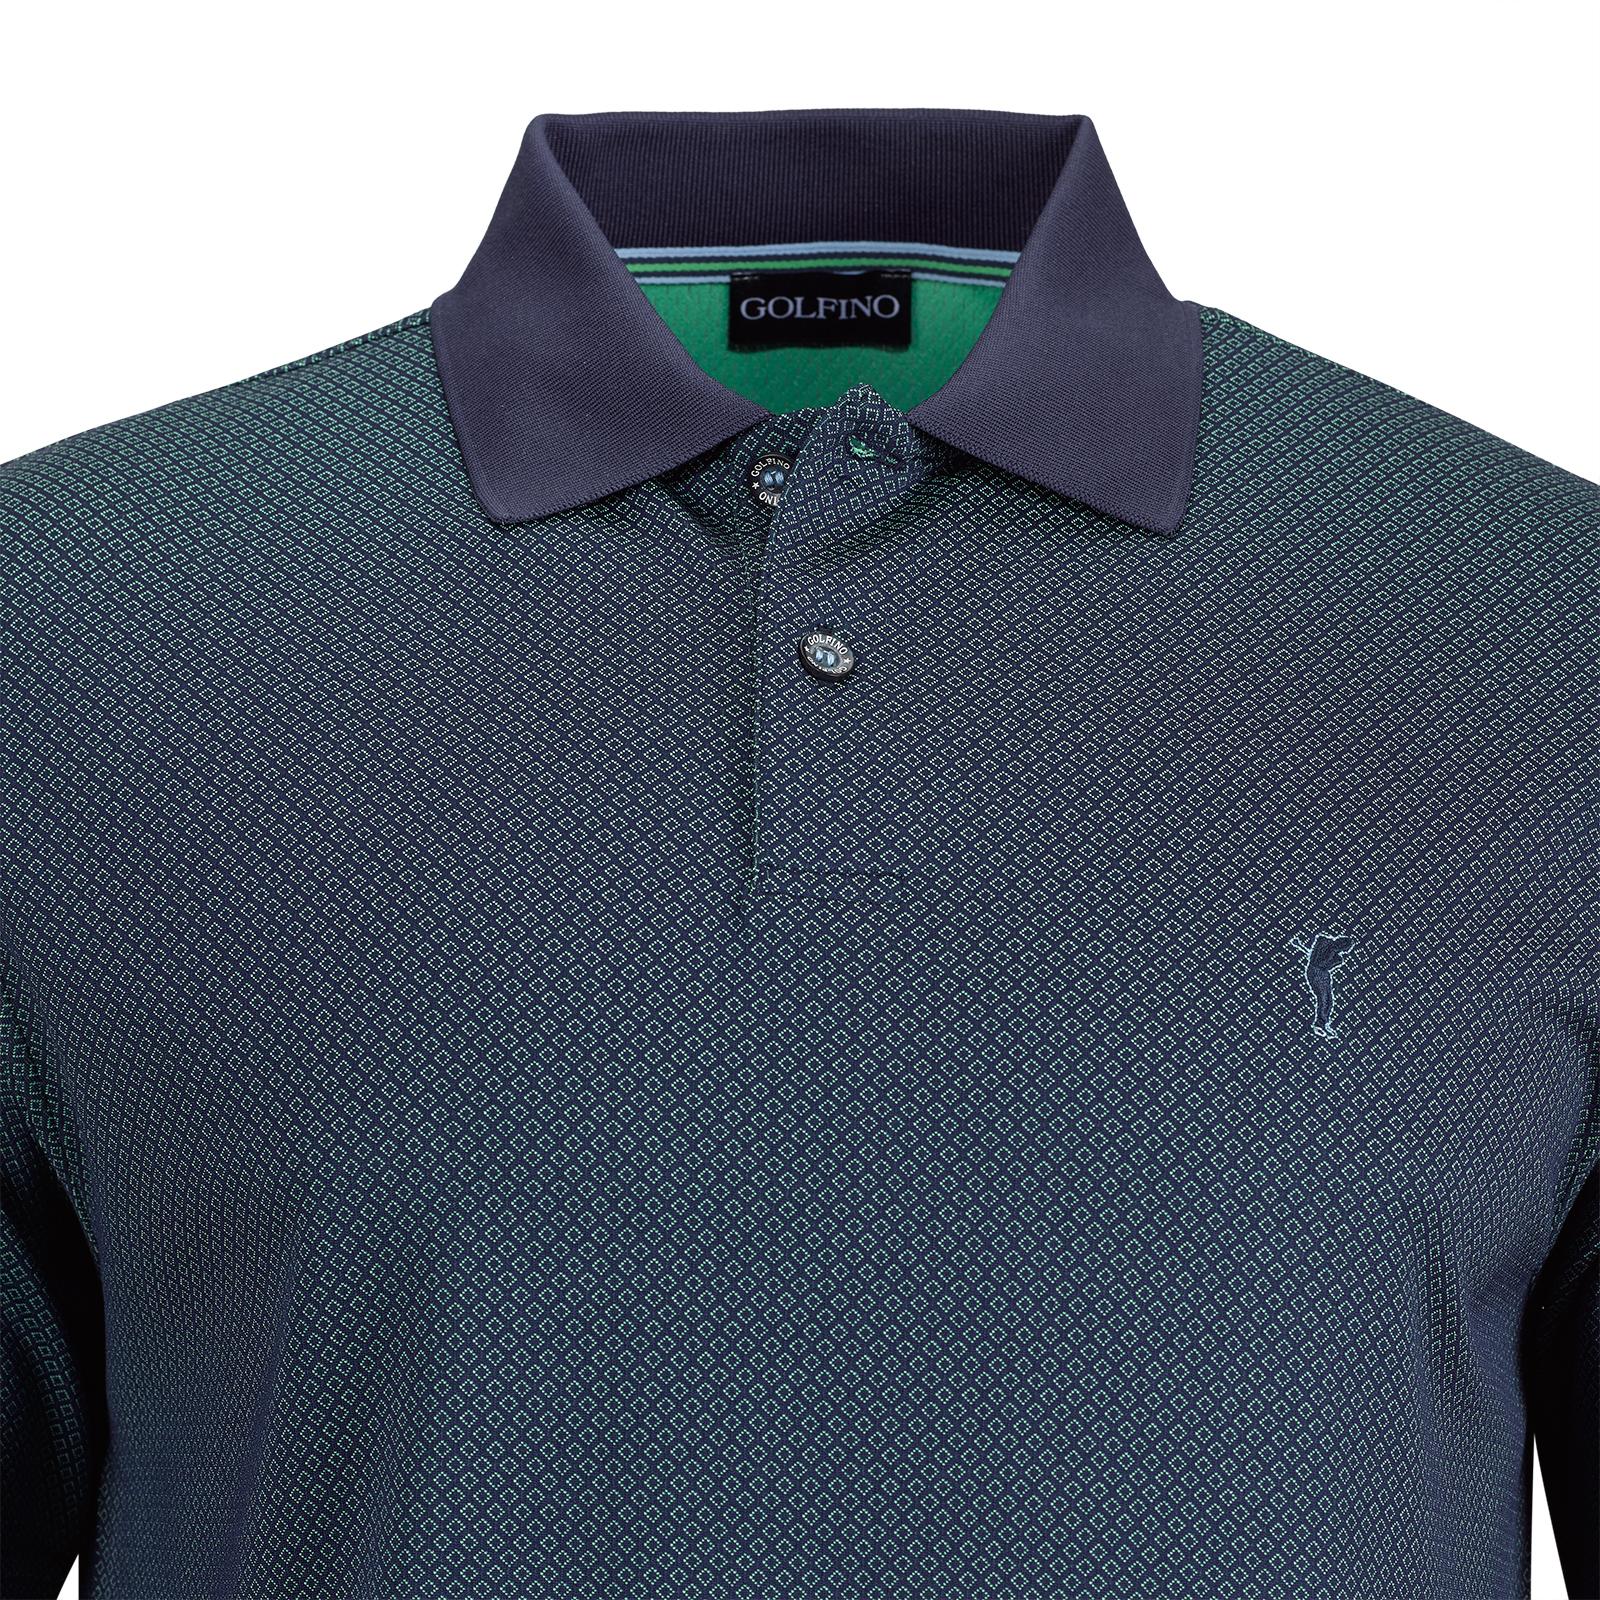 Herren Halbarm Stretch-Poloshirt Performance Trend Green